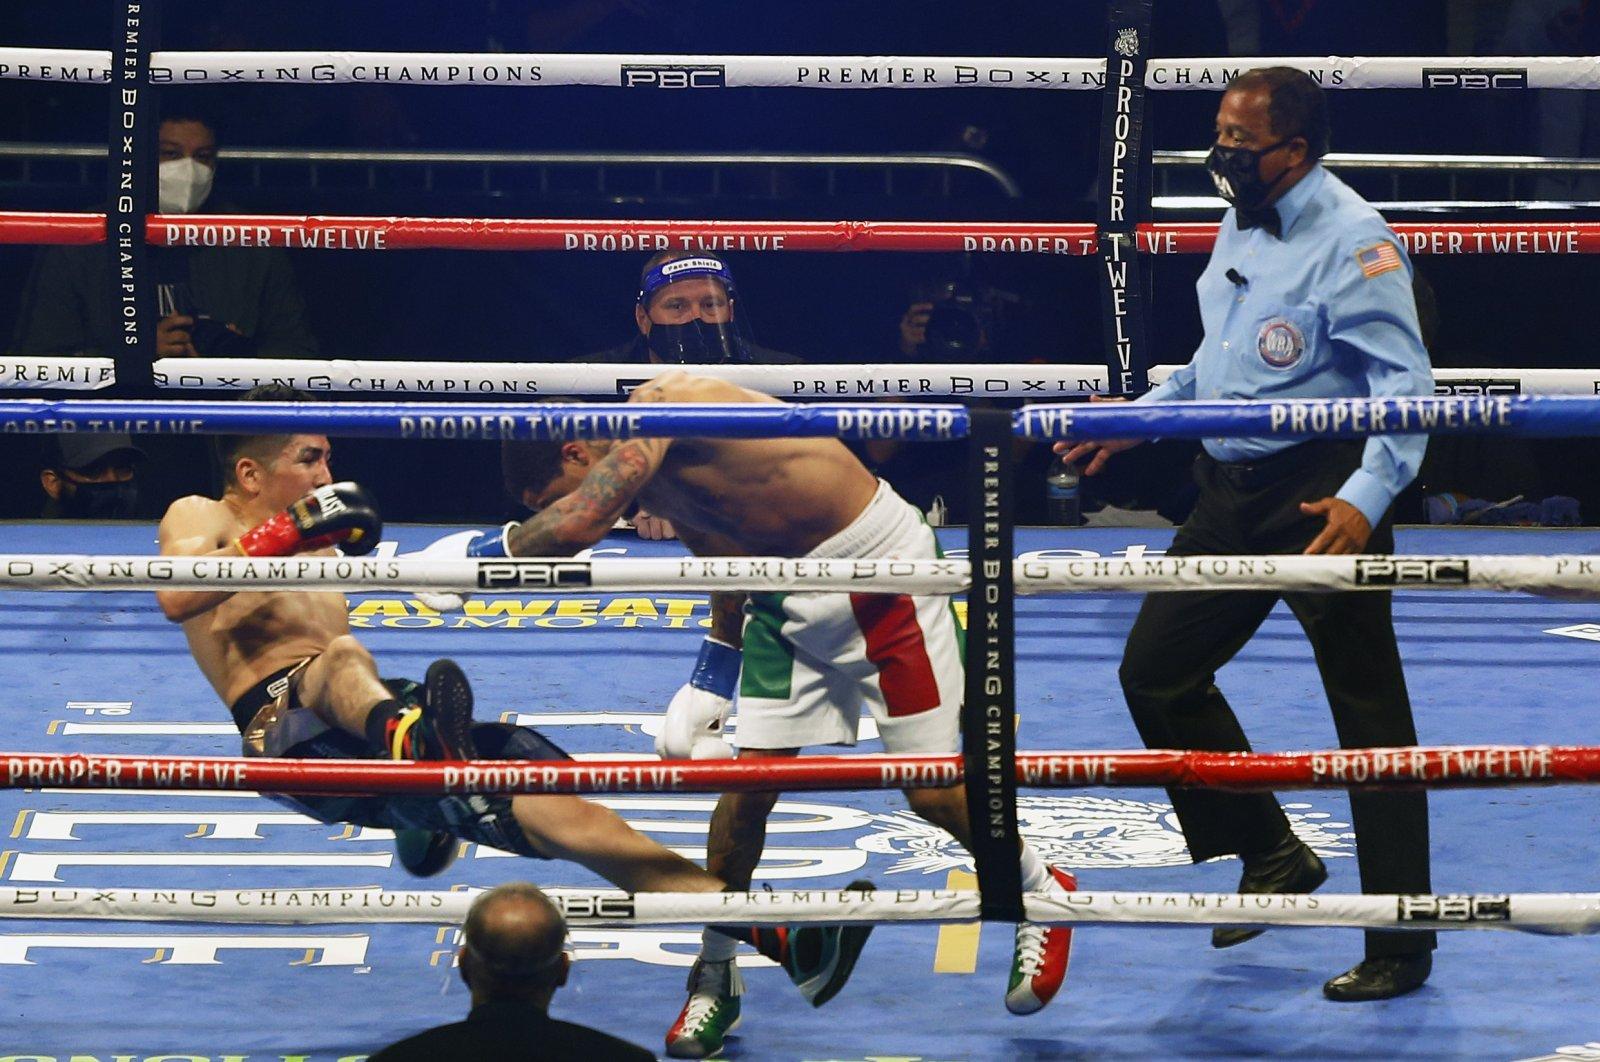 Gervonta Davis (R) pushes Leo Santa Cruz down during a boxing bout in San Antonio, Texas, U.S, Oct. 31, 2020. (AP Photo)